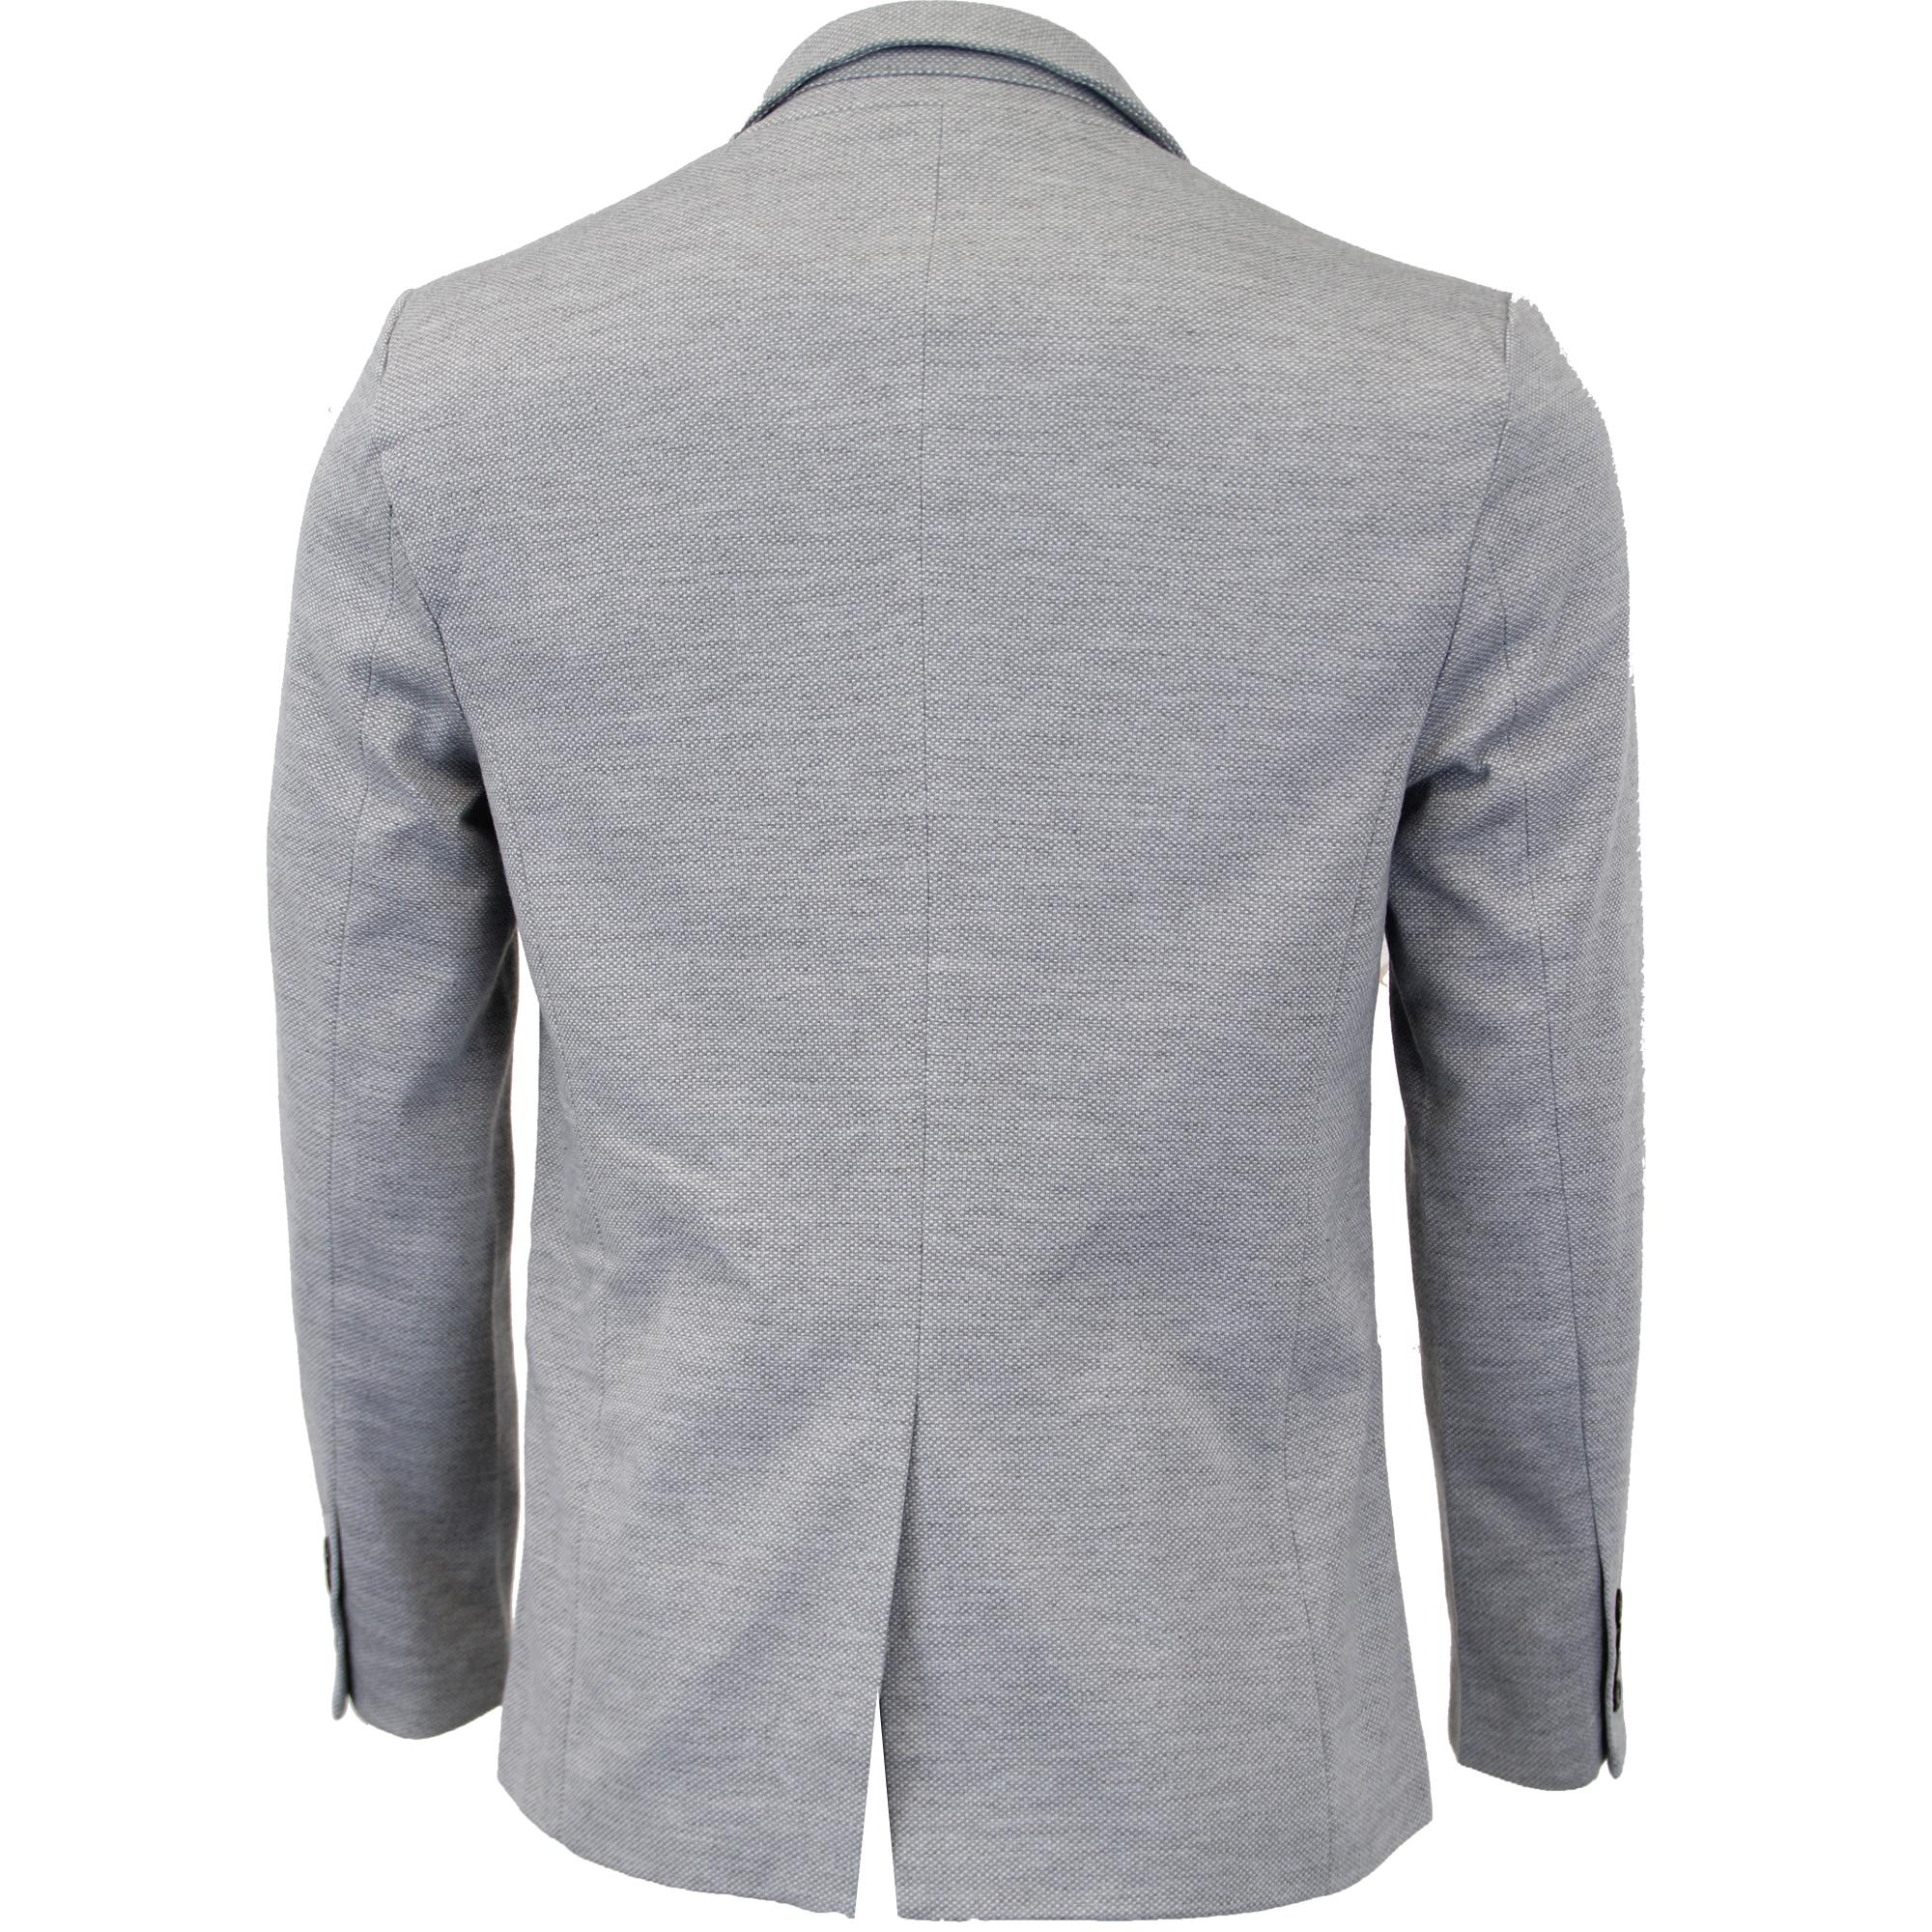 Mens Blazer Process Black Coat Dinner Suit Jacket Pbsimon Formal Wedding Lined